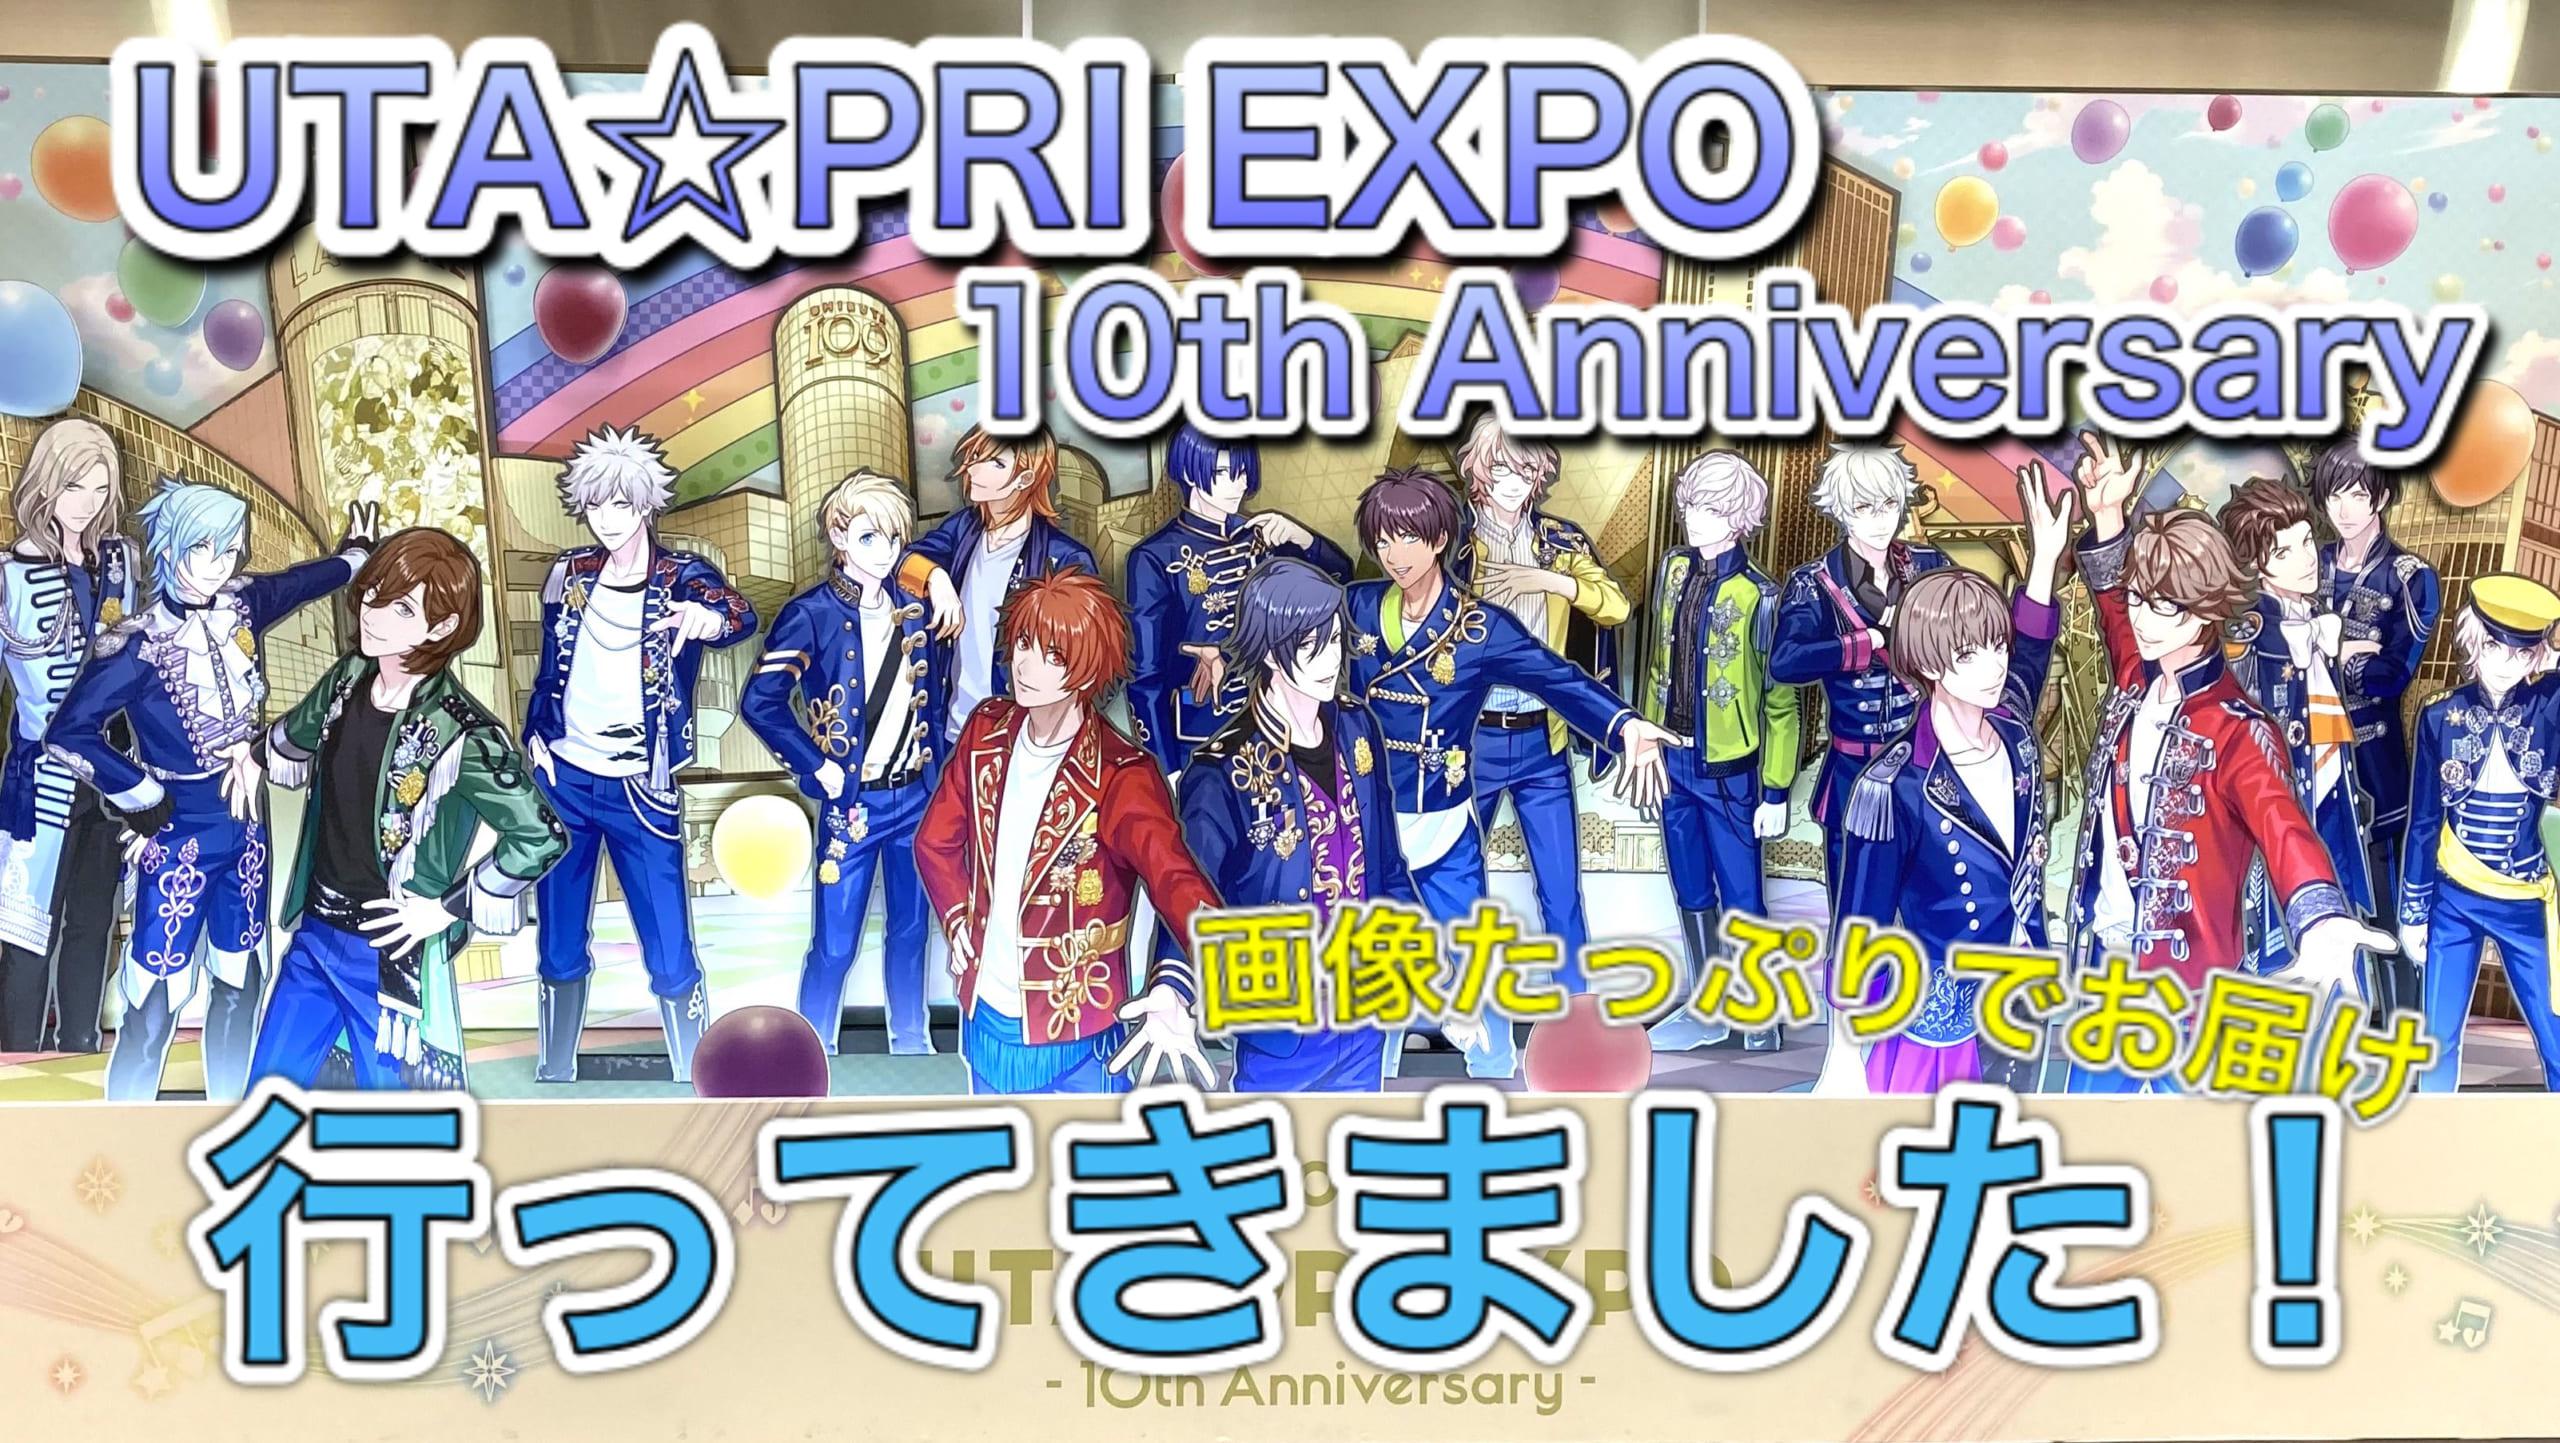 「UTA☆PRI EXPO-10th Anniversary-」レポート!10年の歴史を写真たっぷりでお届け